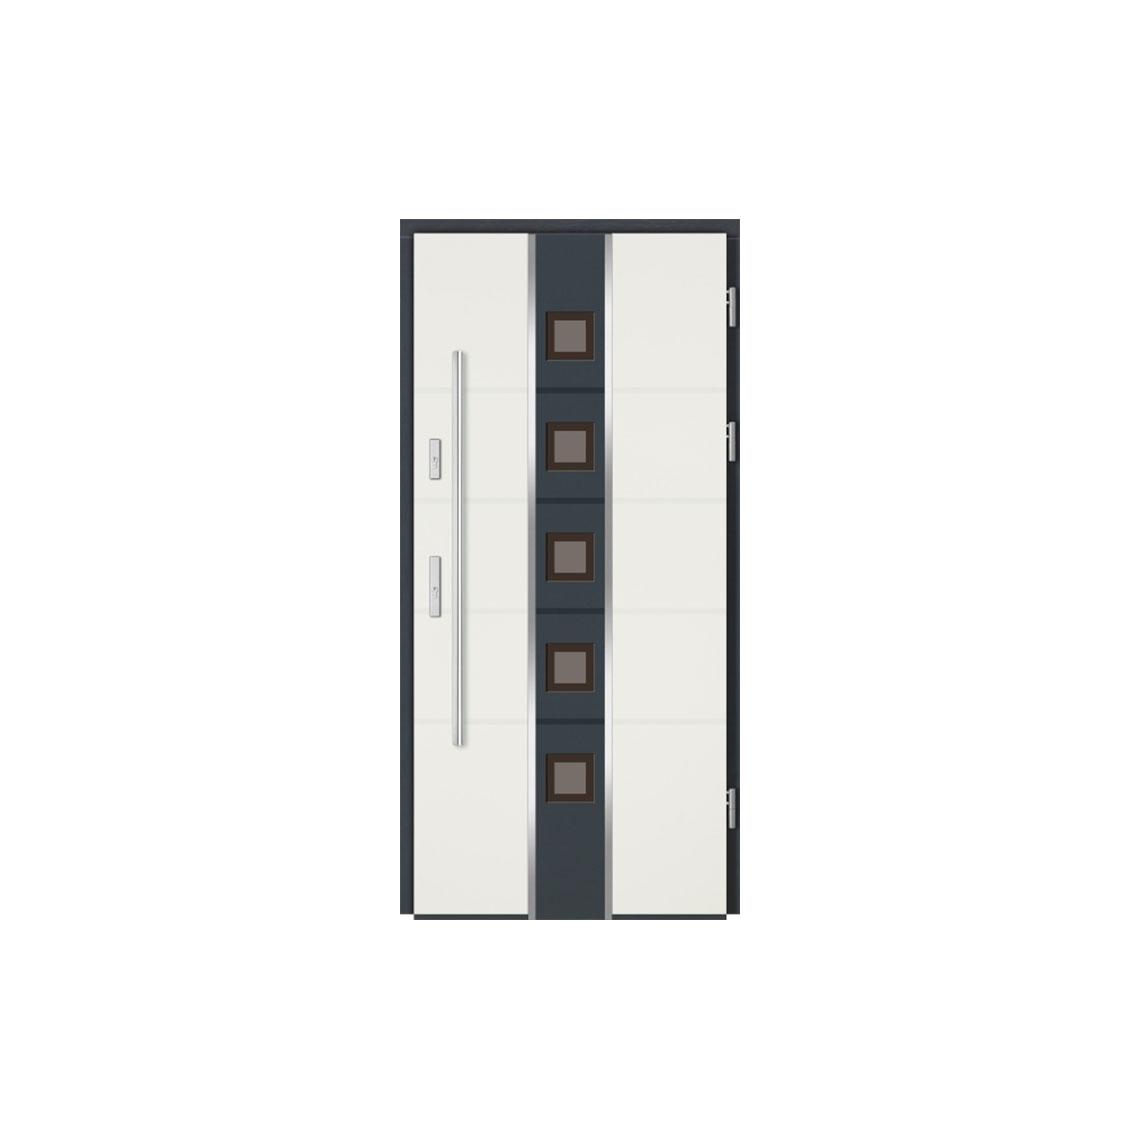 Koka durvis WD-10